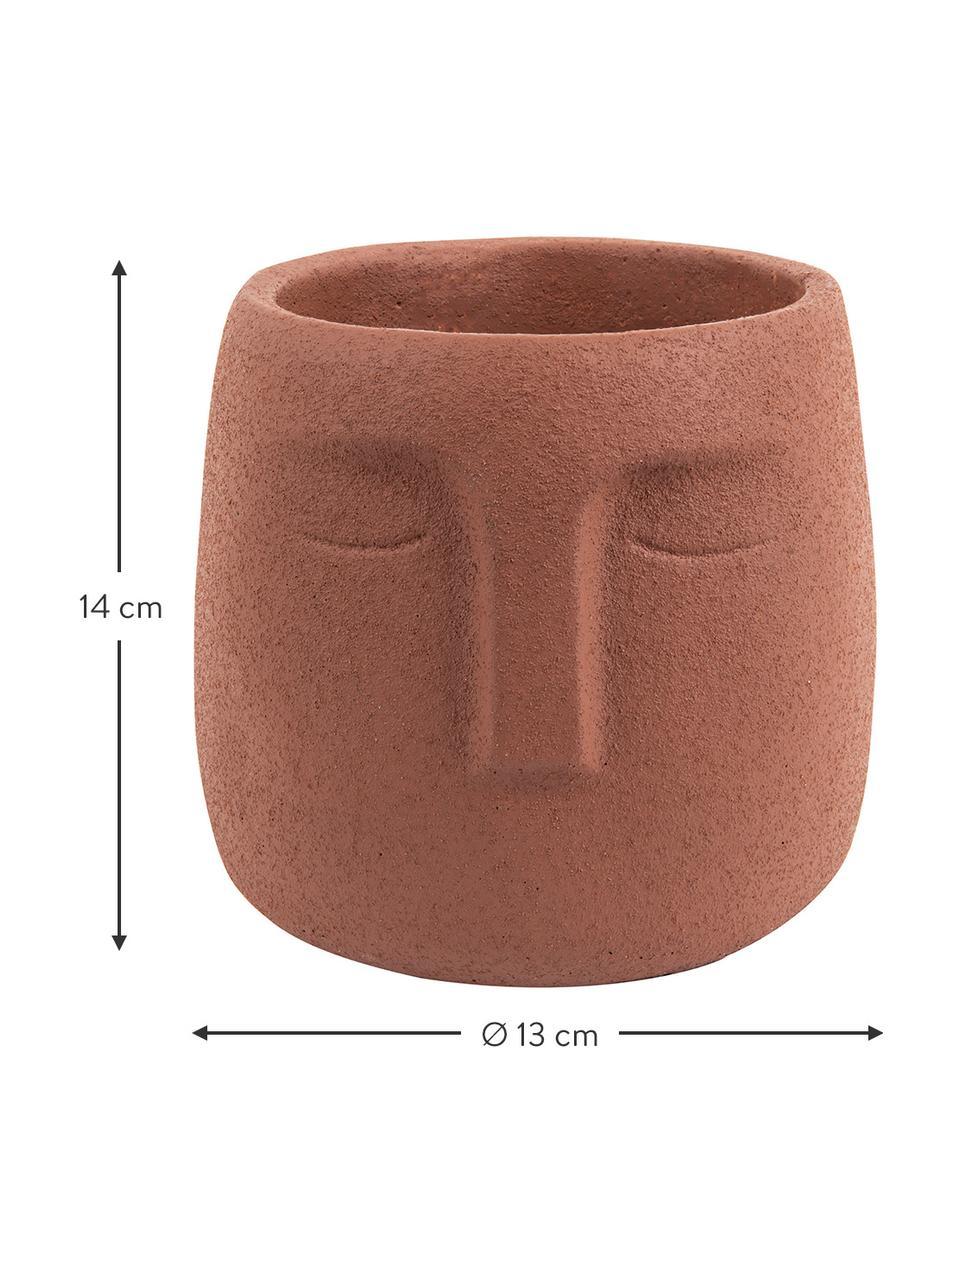 Übertopf  Face aus Keramik, Keramik, Braun, Ø 13 x H 14 cm